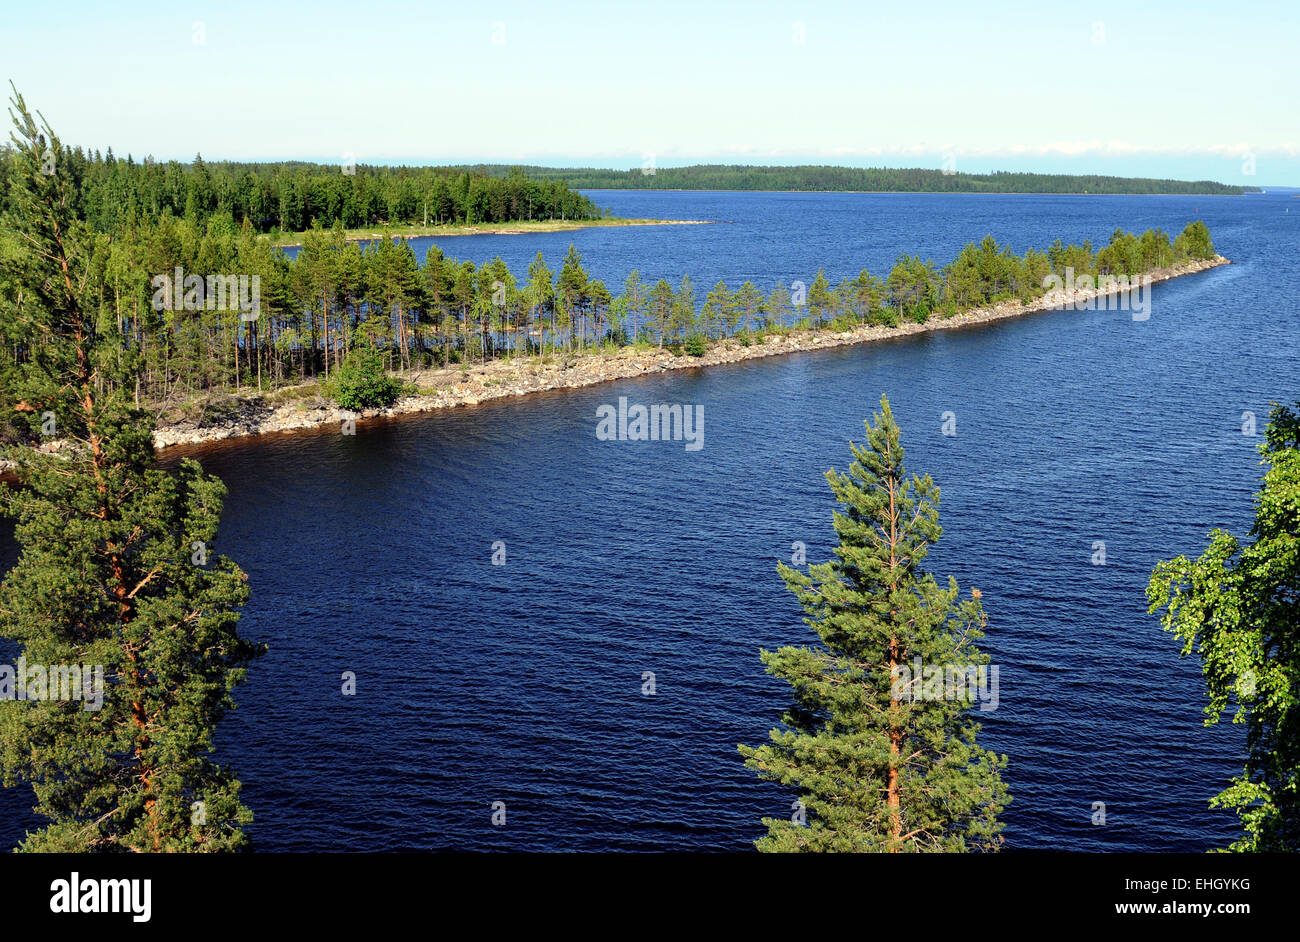 Finnische Seenlandschaft / Finnish landscape - Stock Image